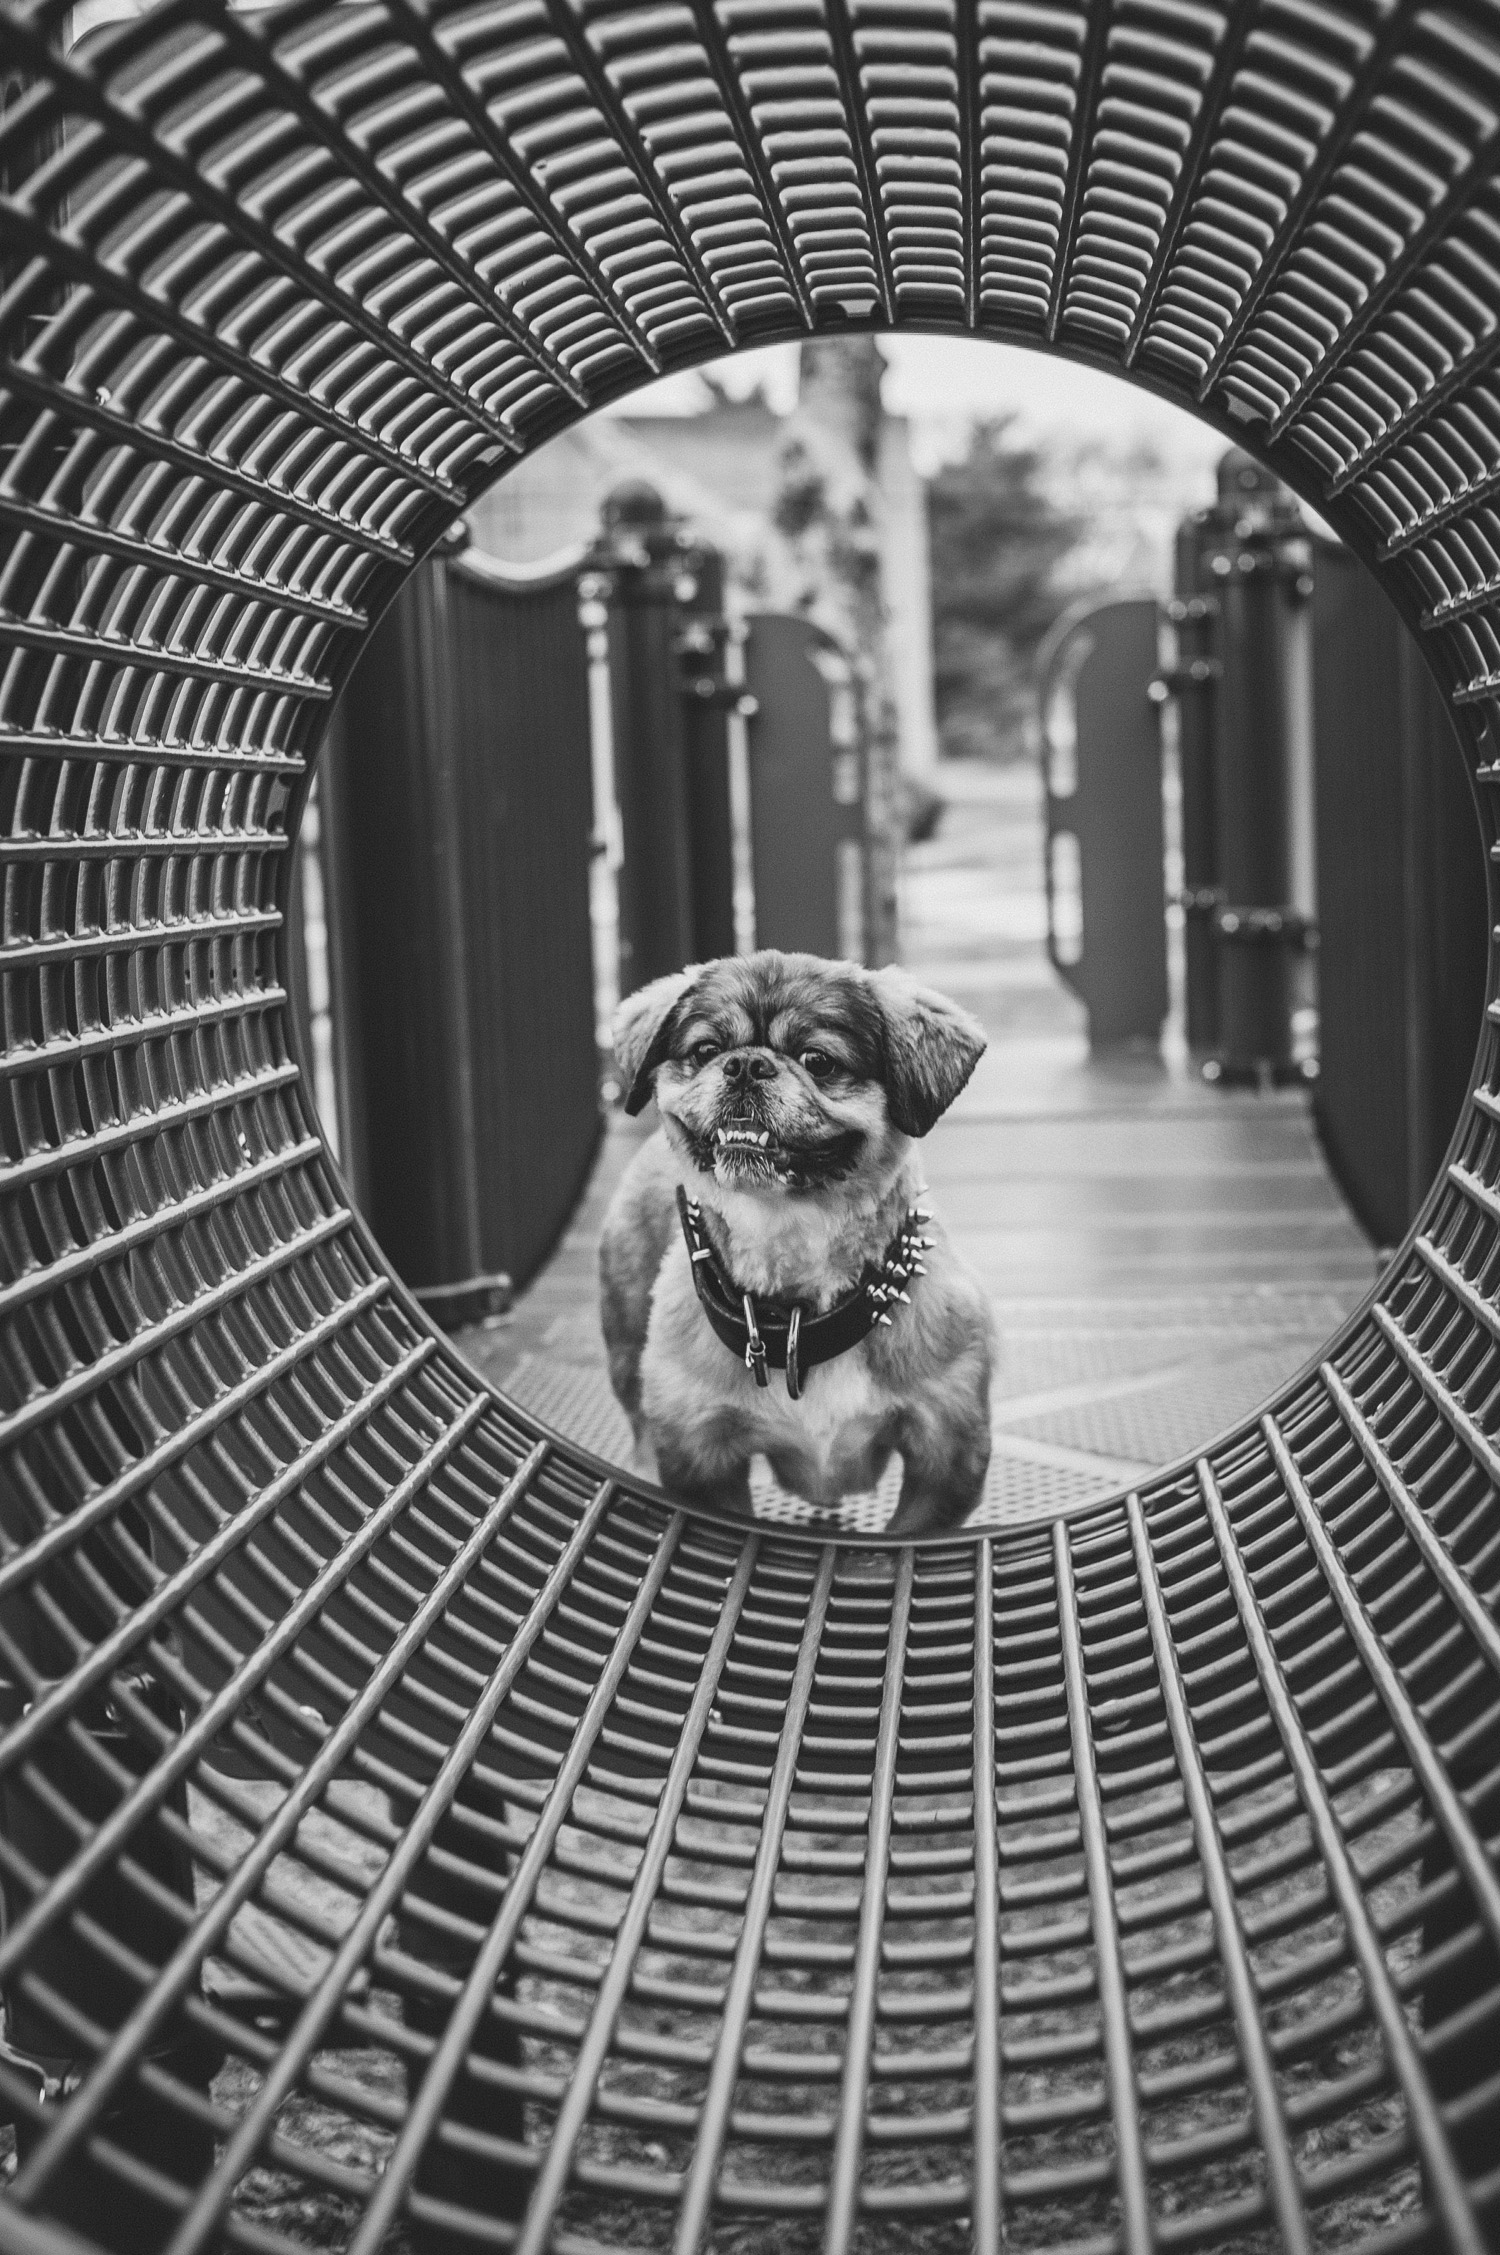 pat-robinson-photography-dog-10.jpg